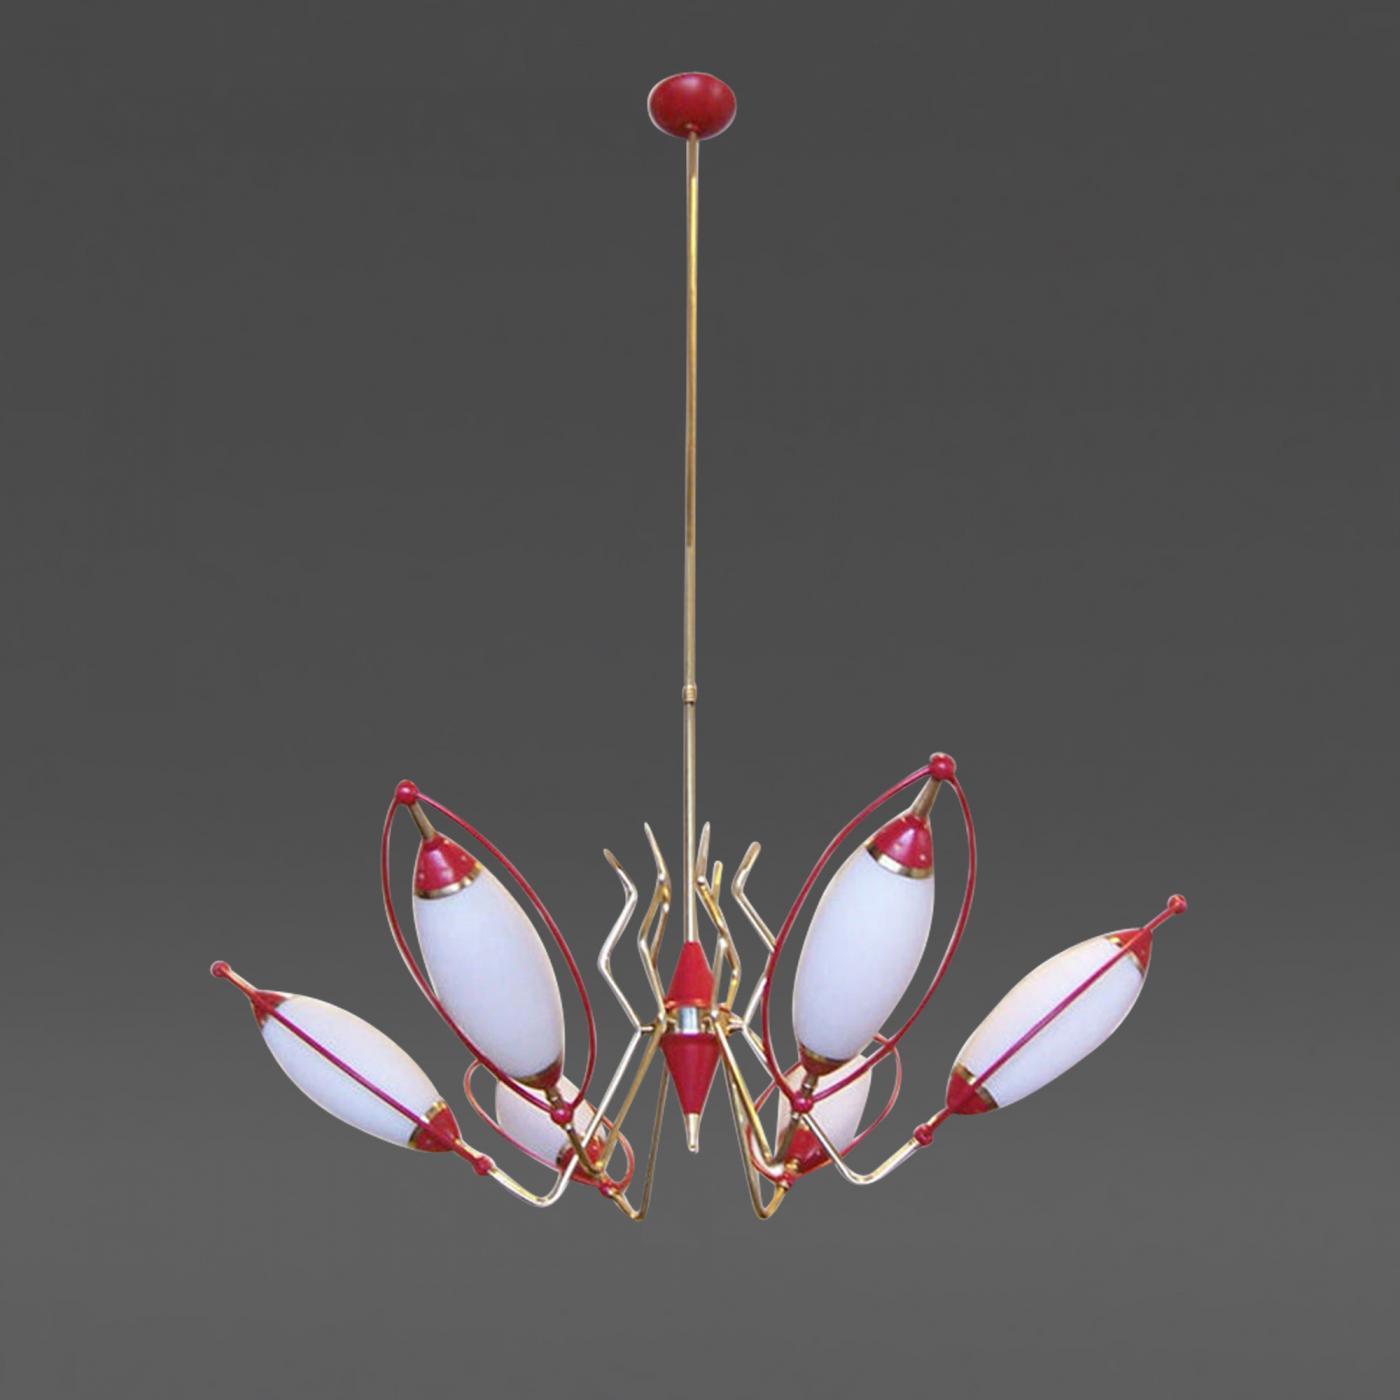 Oscar torlasco oscar torlasco six light red and white cone chandelier listings furniture lighting chandeliers and pendants arubaitofo Choice Image